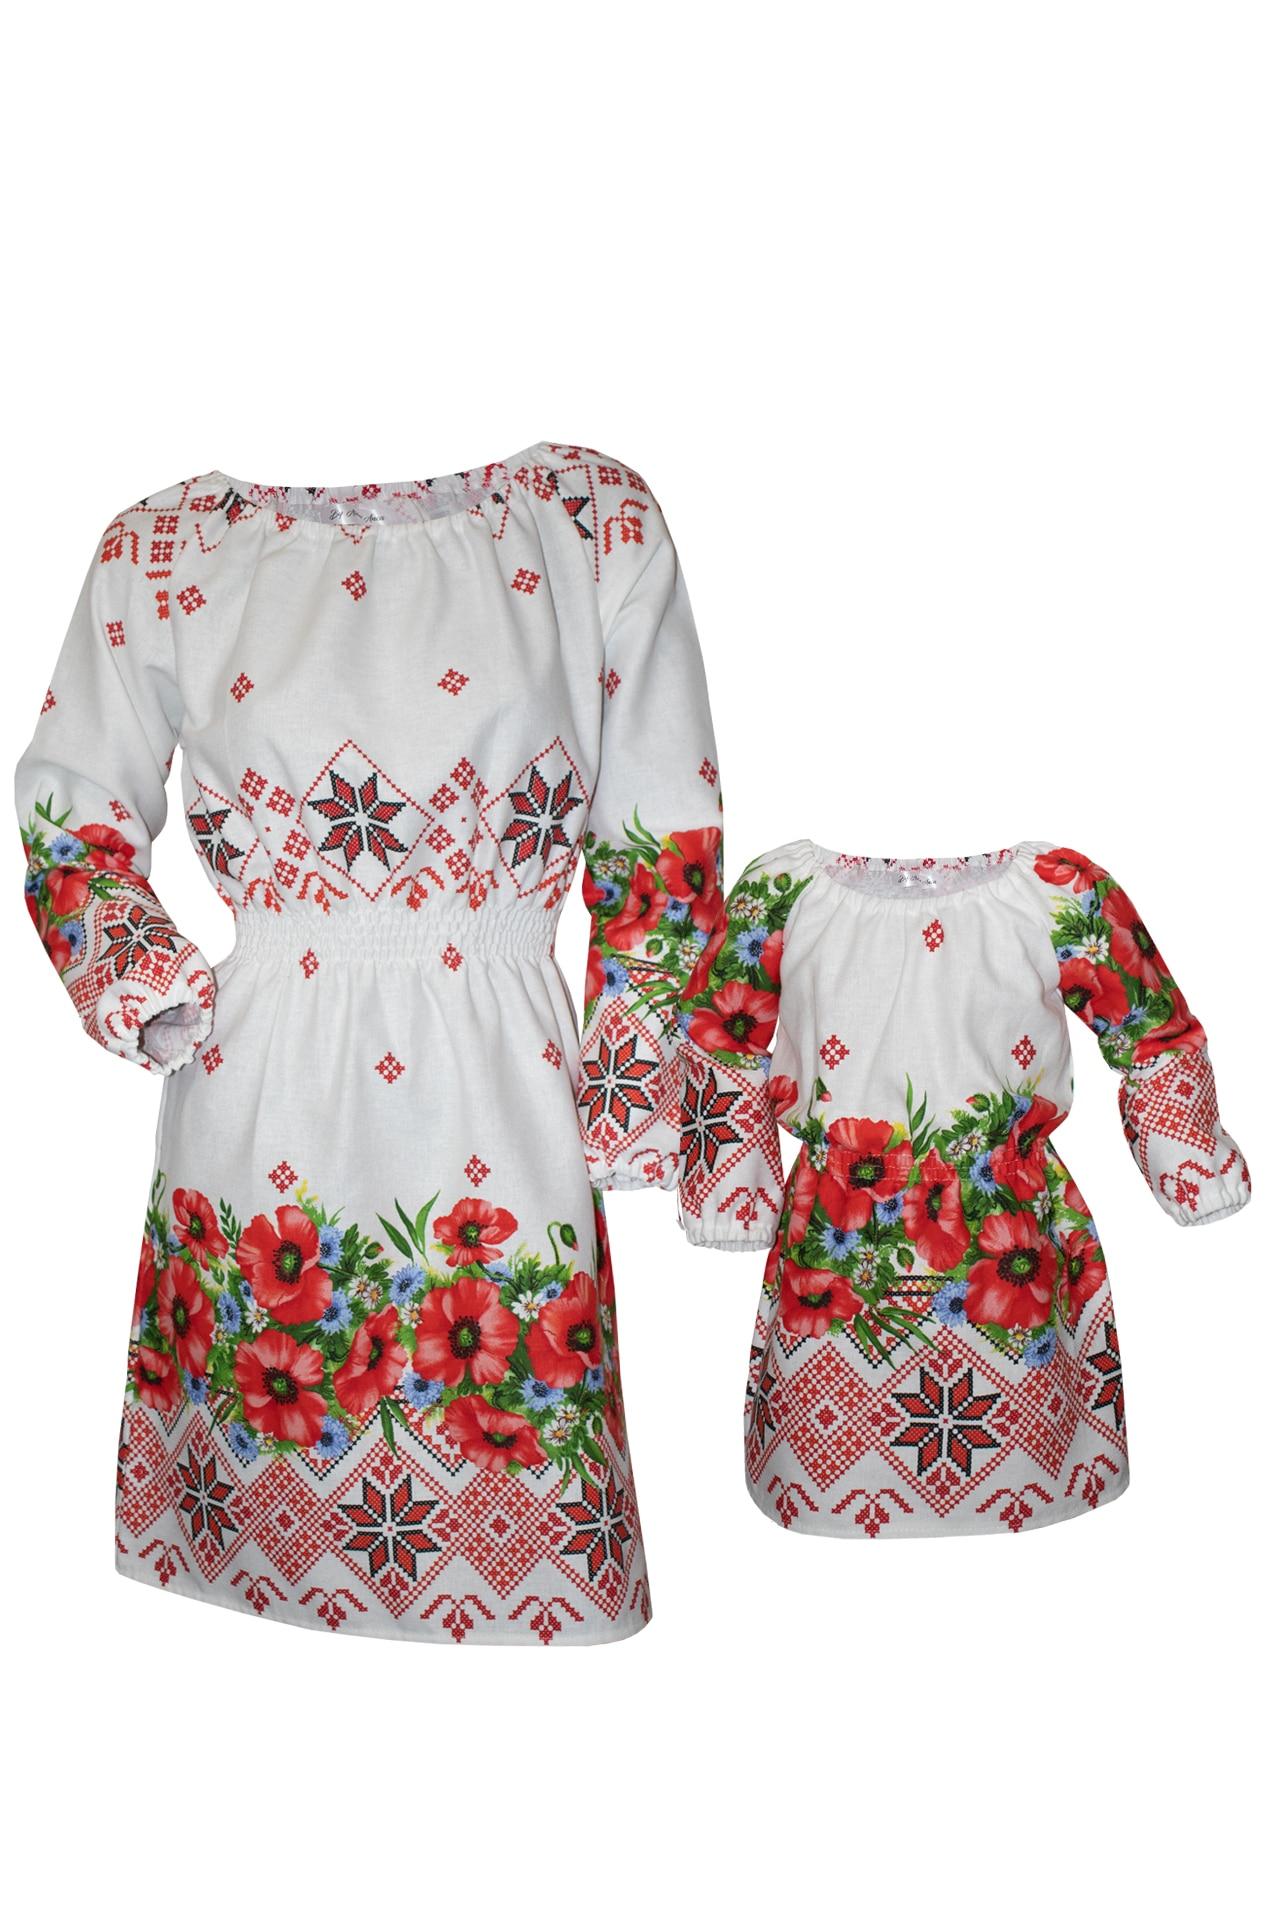 Set mama / fiica rochii pe fond alb cu imprimeu traditional floral, marimea M + 1/2 ani